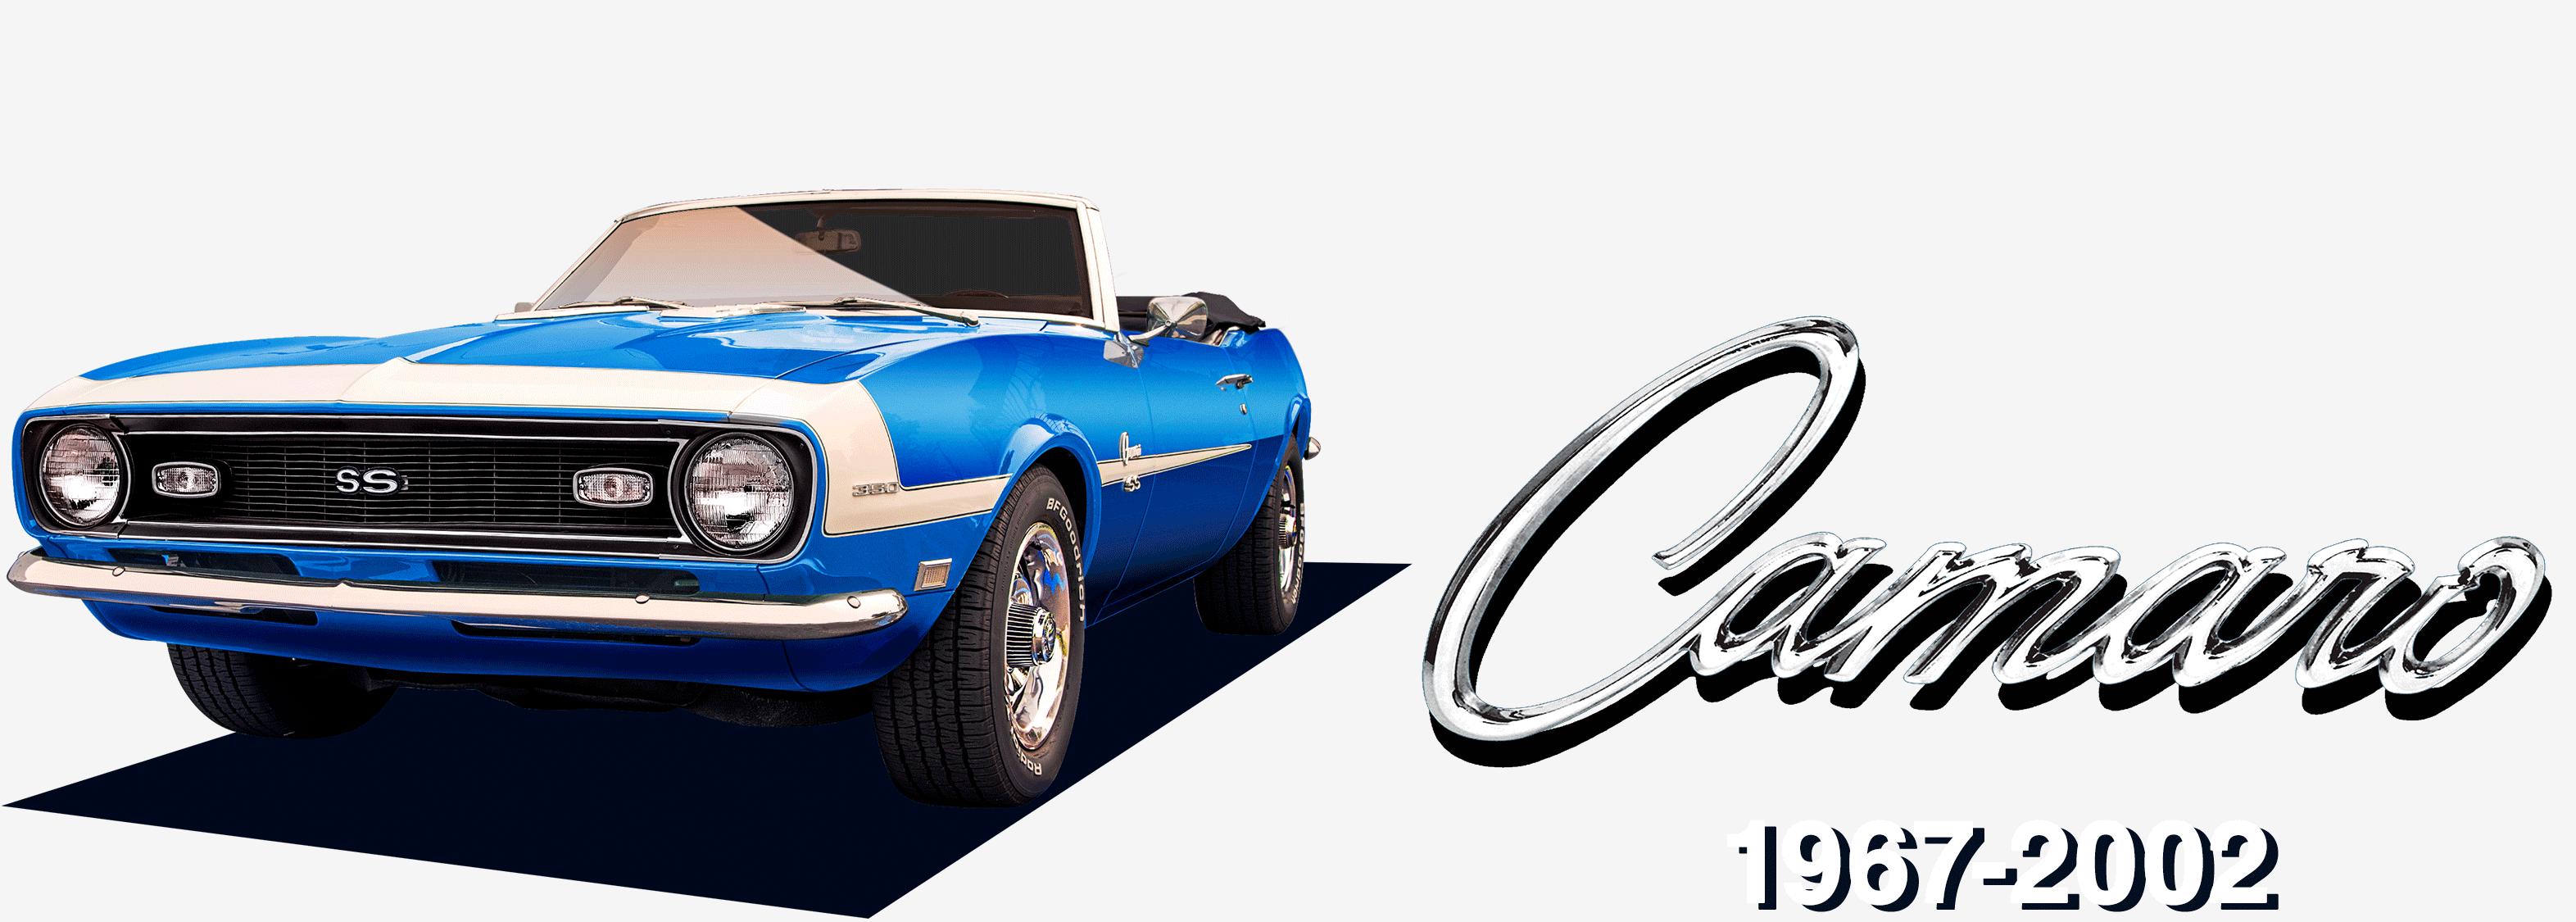 1967,1968,1969 - 2002 Camaro Parts and Accessories